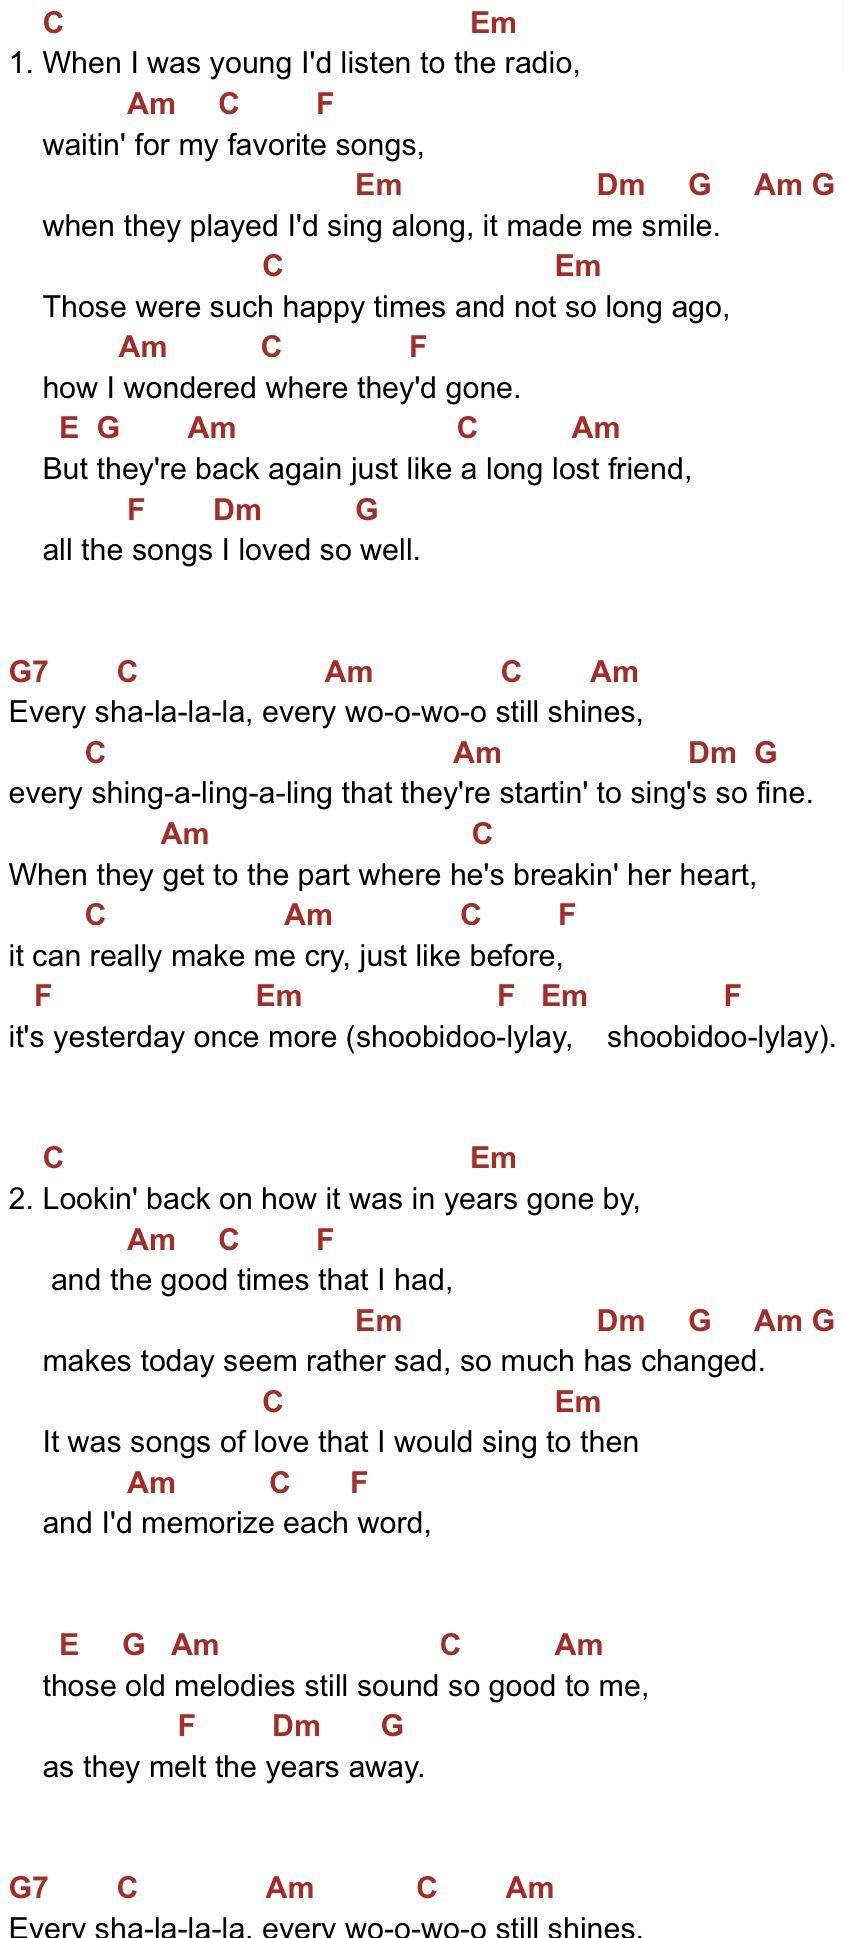 Pin By Pencil Studio On Ukulele Carpenters Songs Ukulele Songs Great Song Lyrics